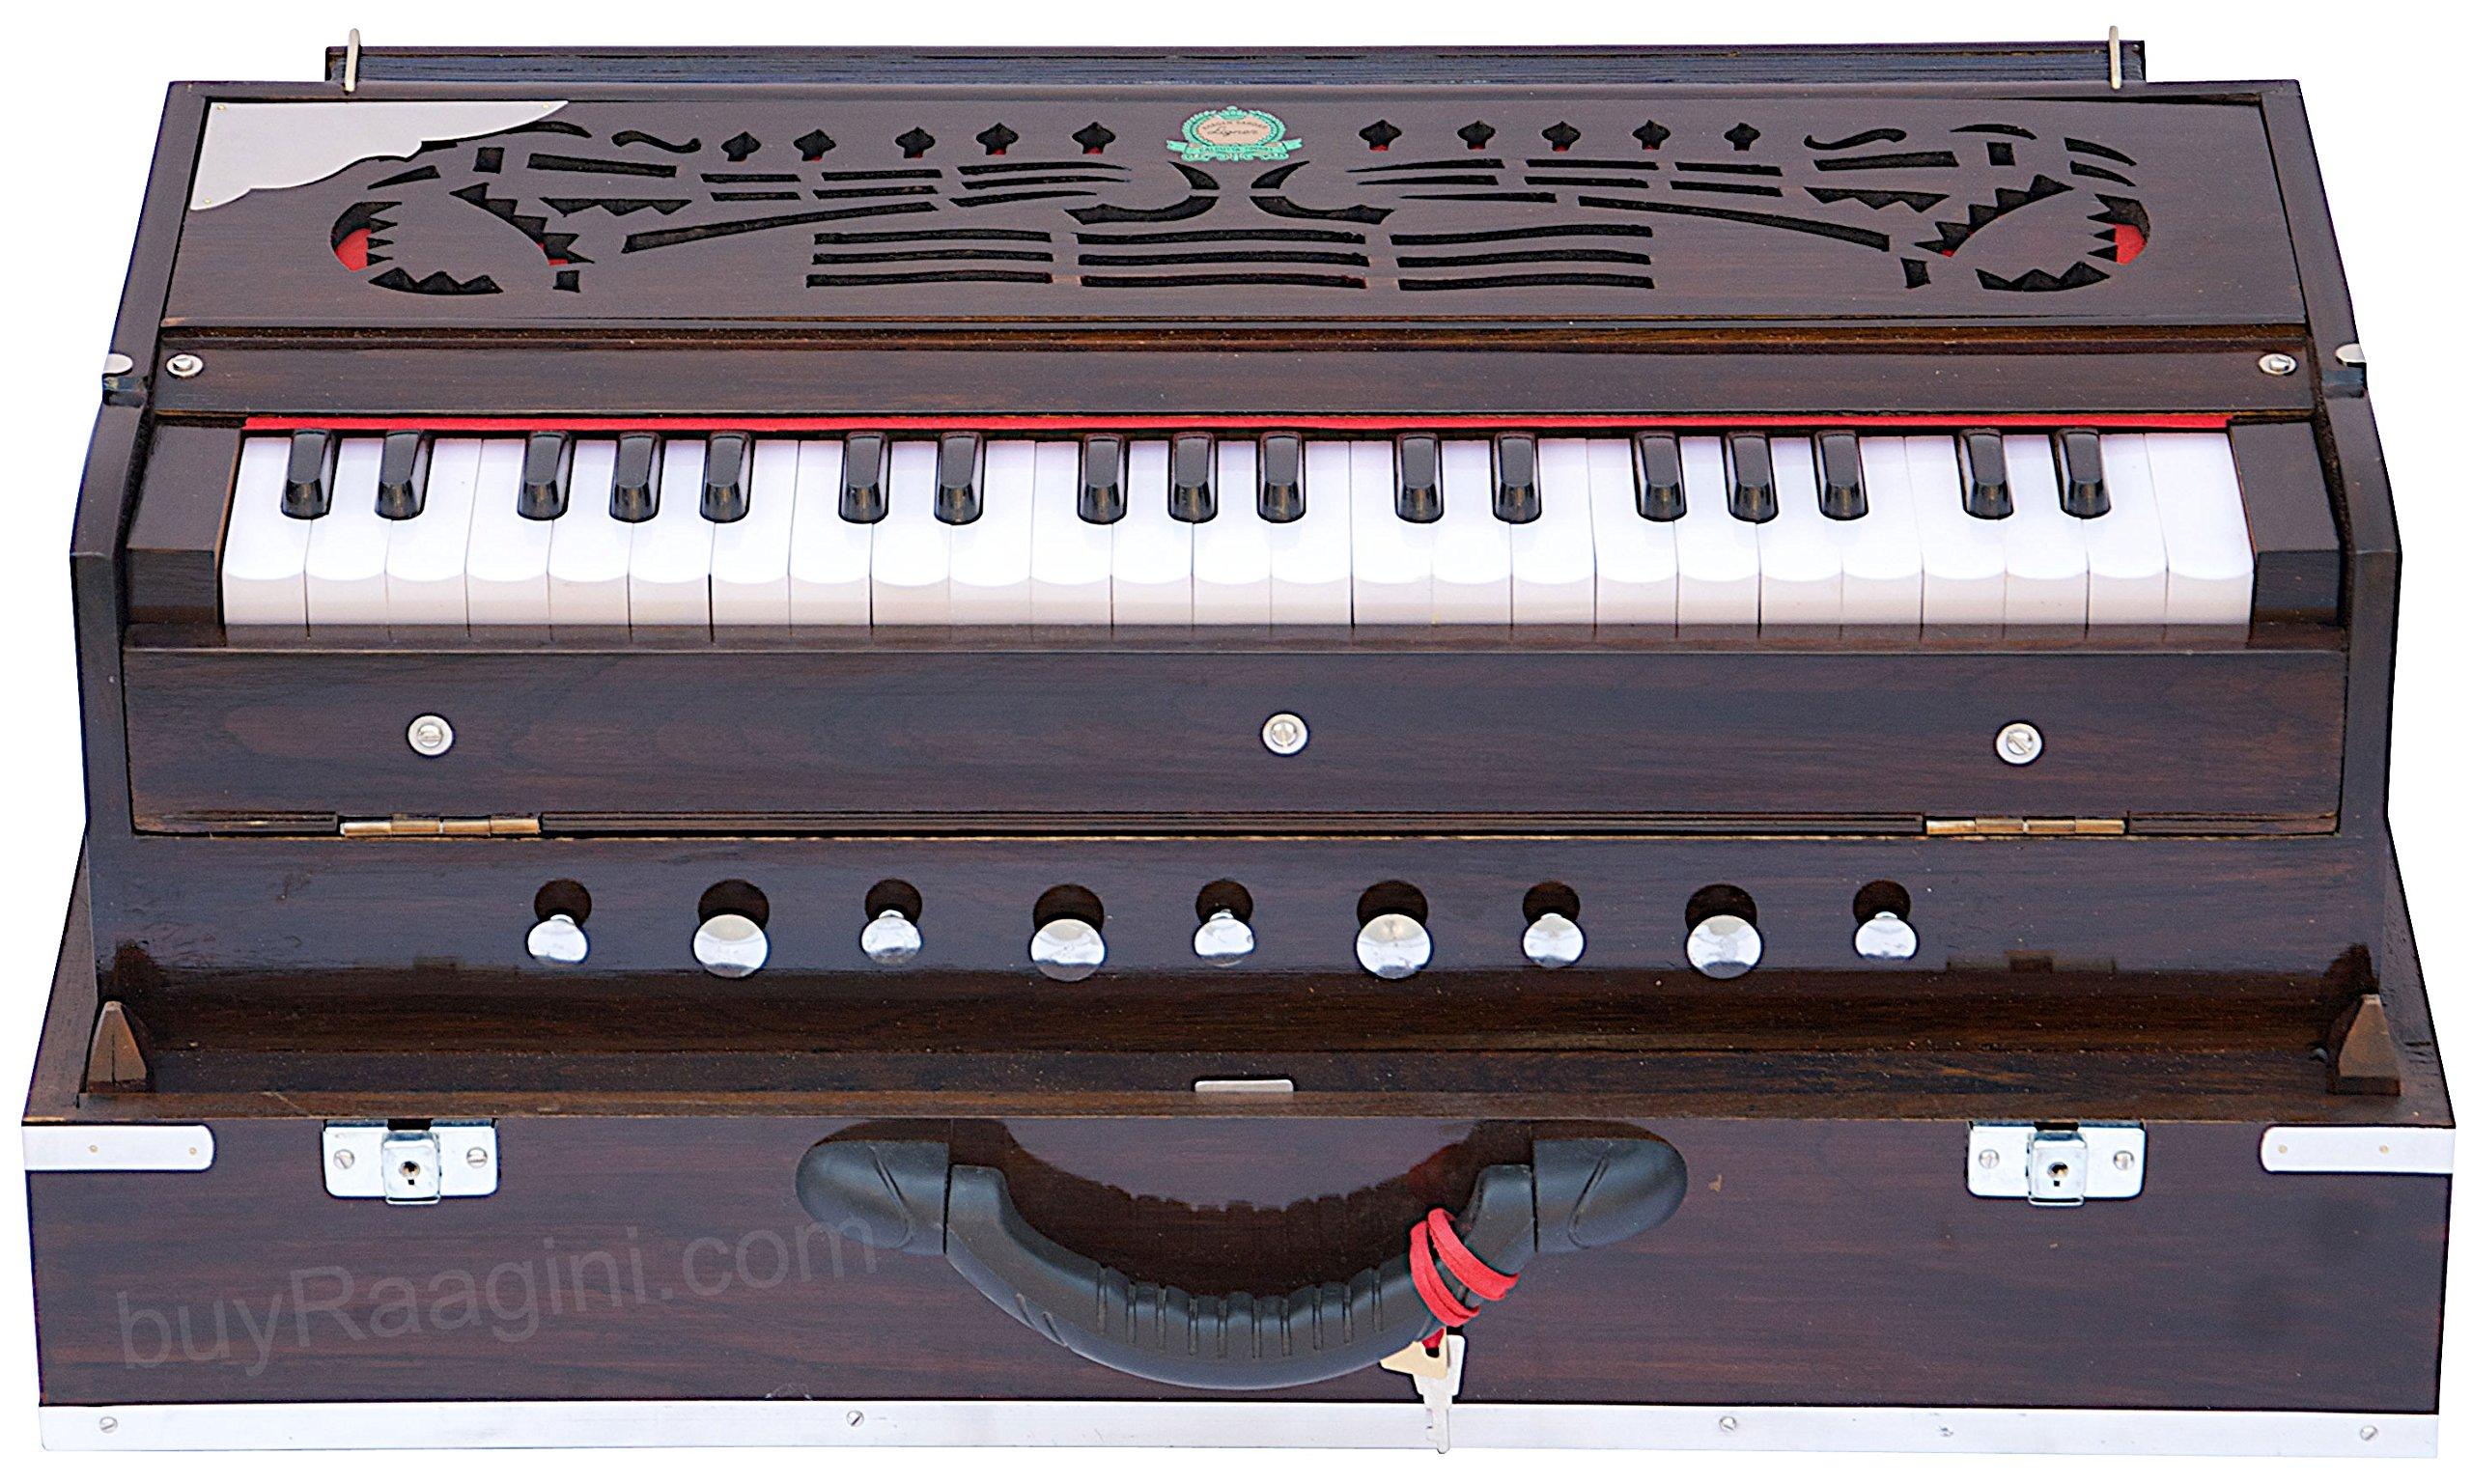 Harmonium Instrument, Monoj K Sardar MKS, Concert Quality, Folding, Three Reed B-M-F, Dark Mahogany Color, 9 Stop, 3 1/2 Octaves, Padded Bag, Book, Indian Musical Instrument (PDI-FEB) by Monoj Kr Sardar for buyRaagini.com